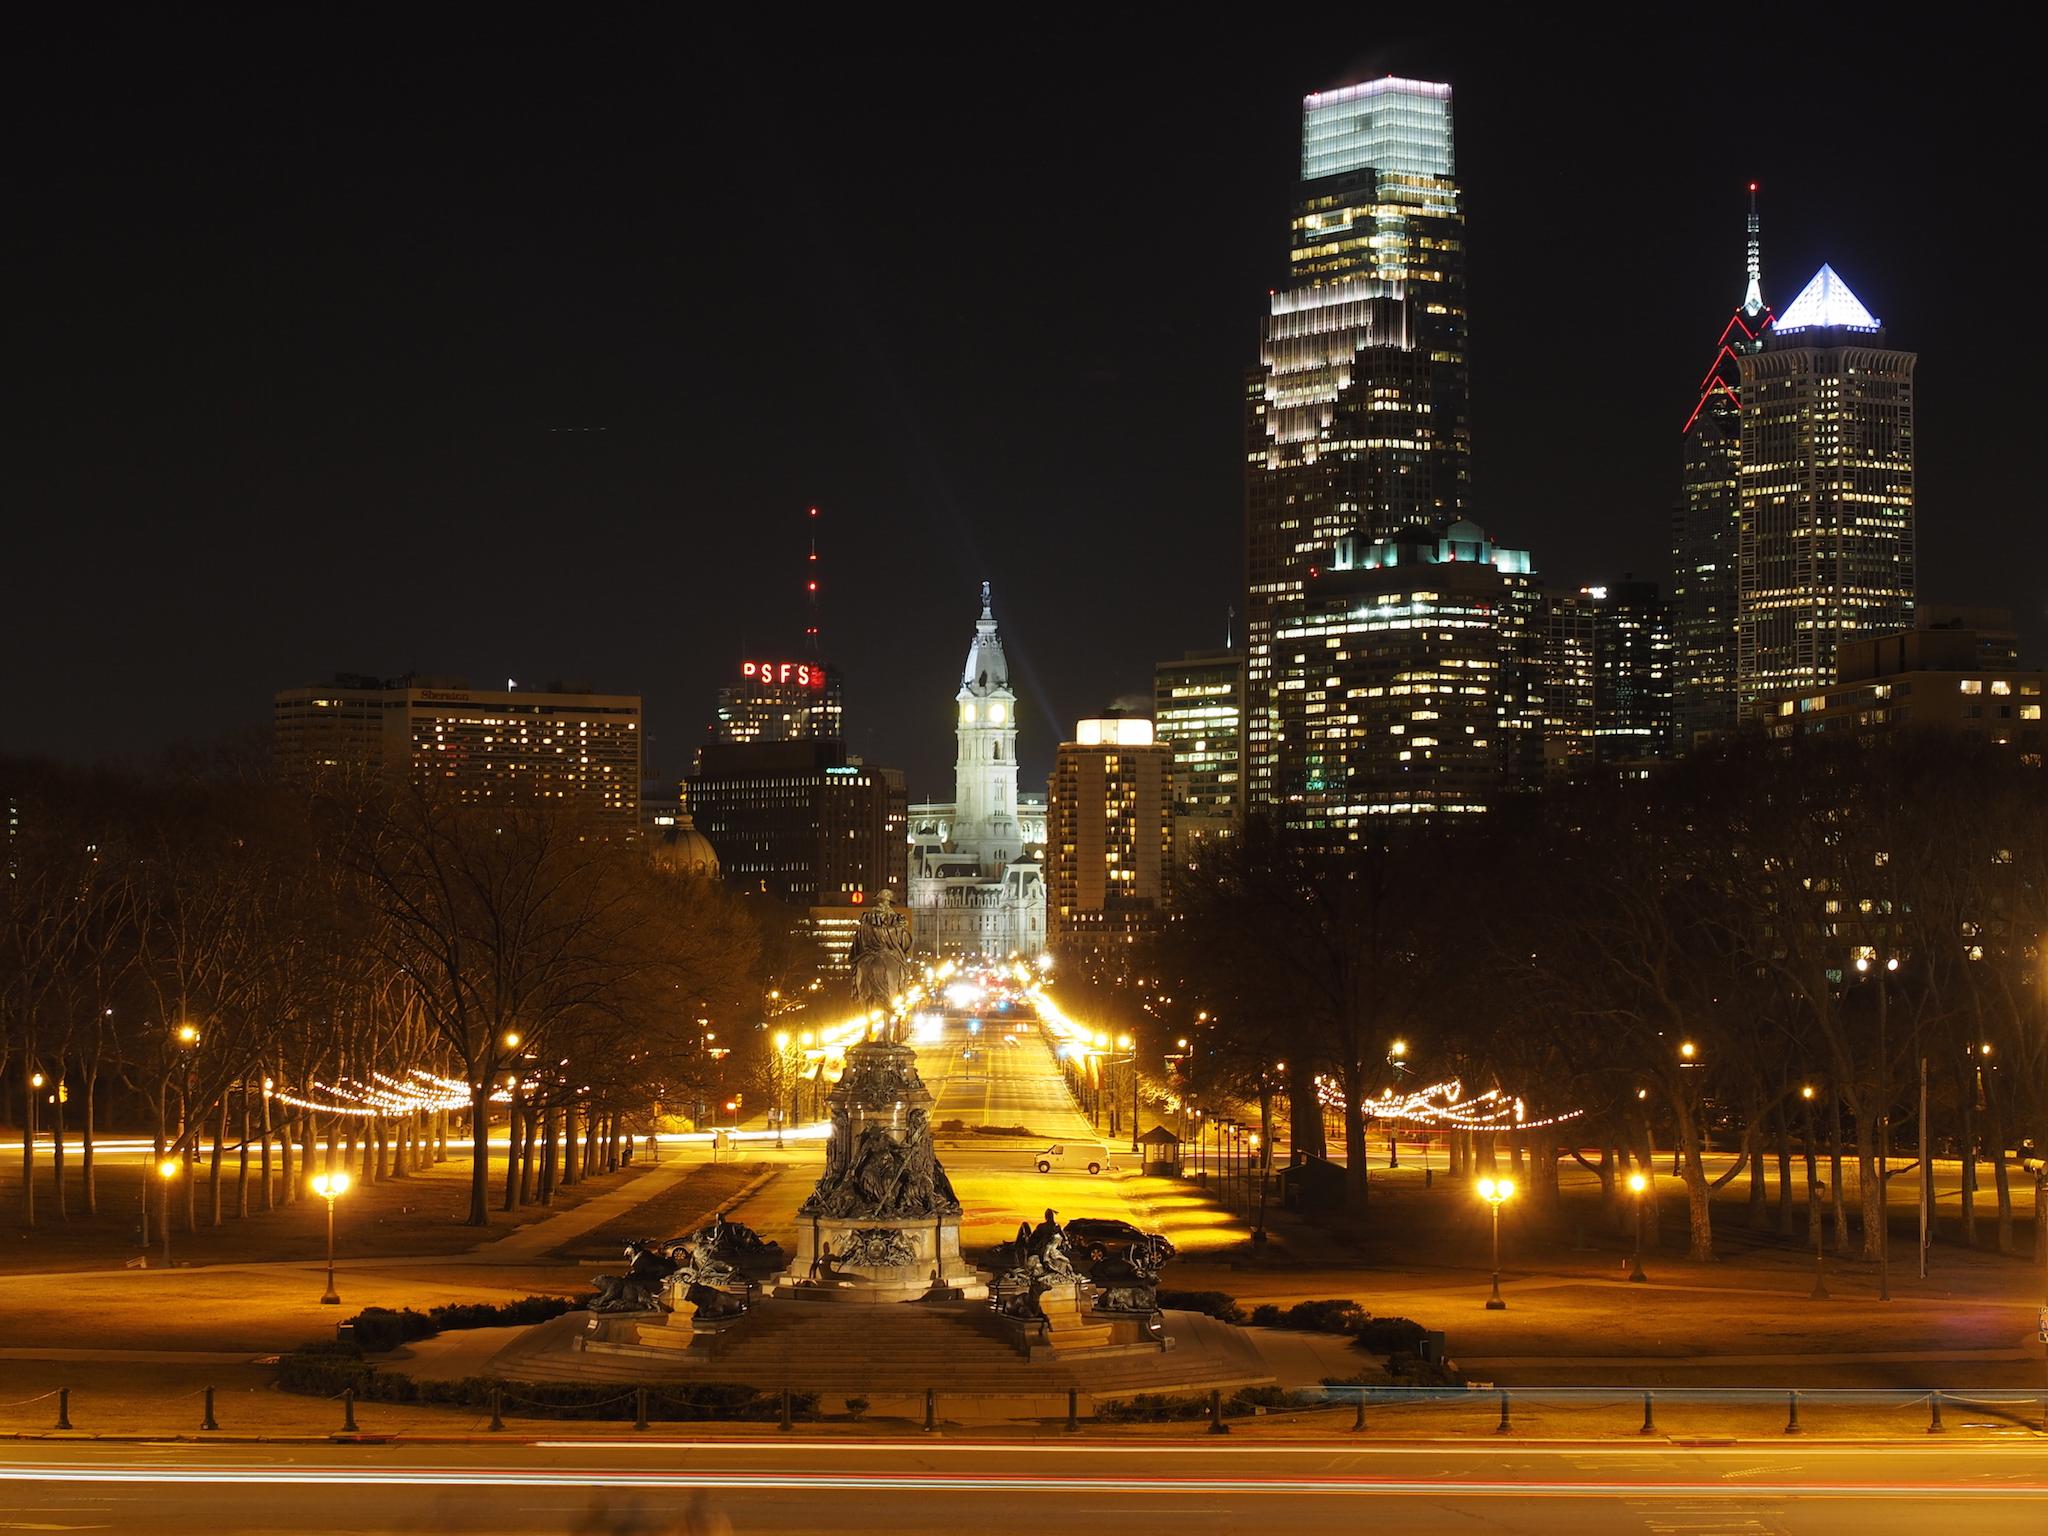 Philly4.JPG